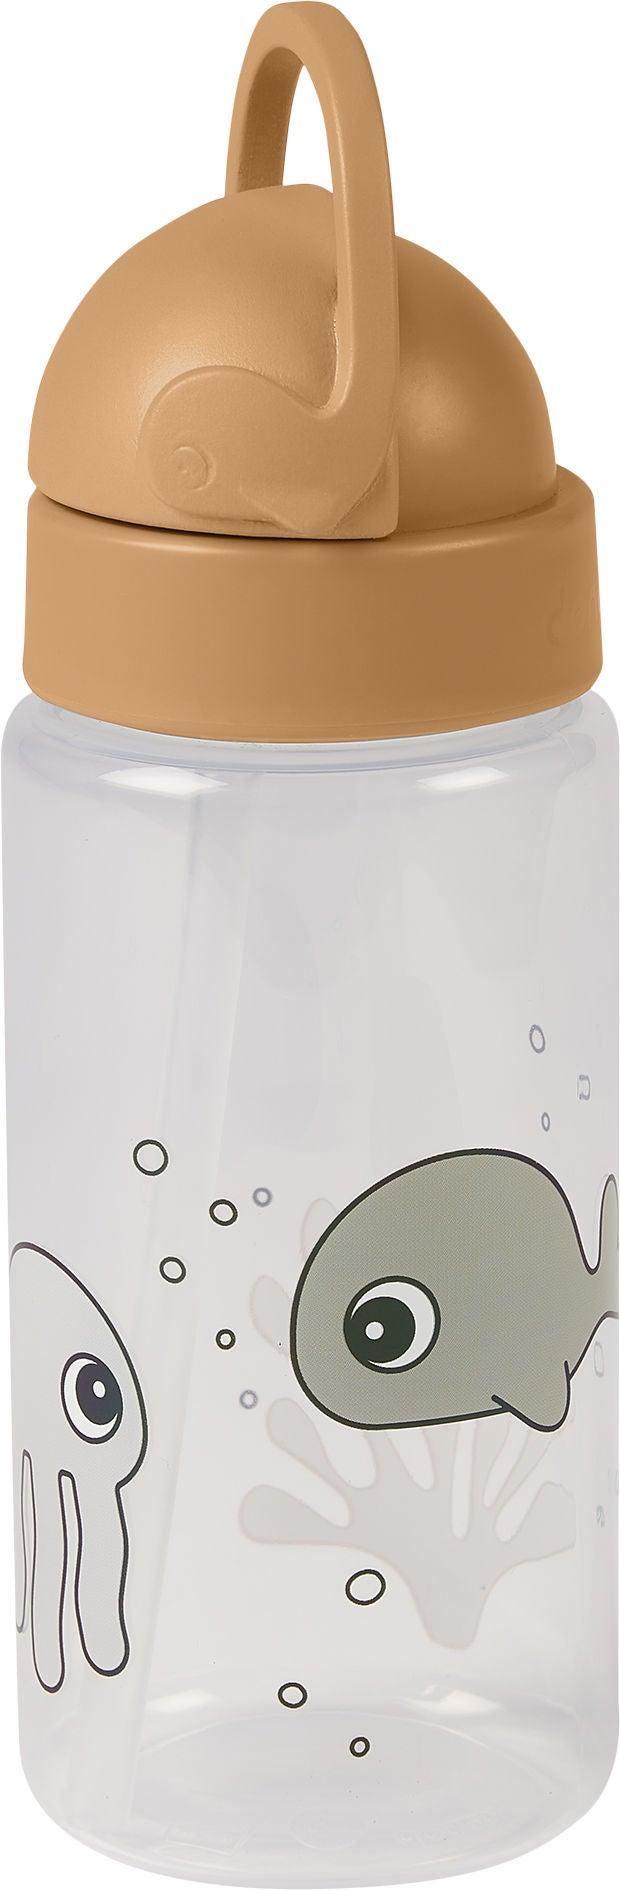 Done by Deer Flaska med Sugrör Sea Friends, Mustard/Grey